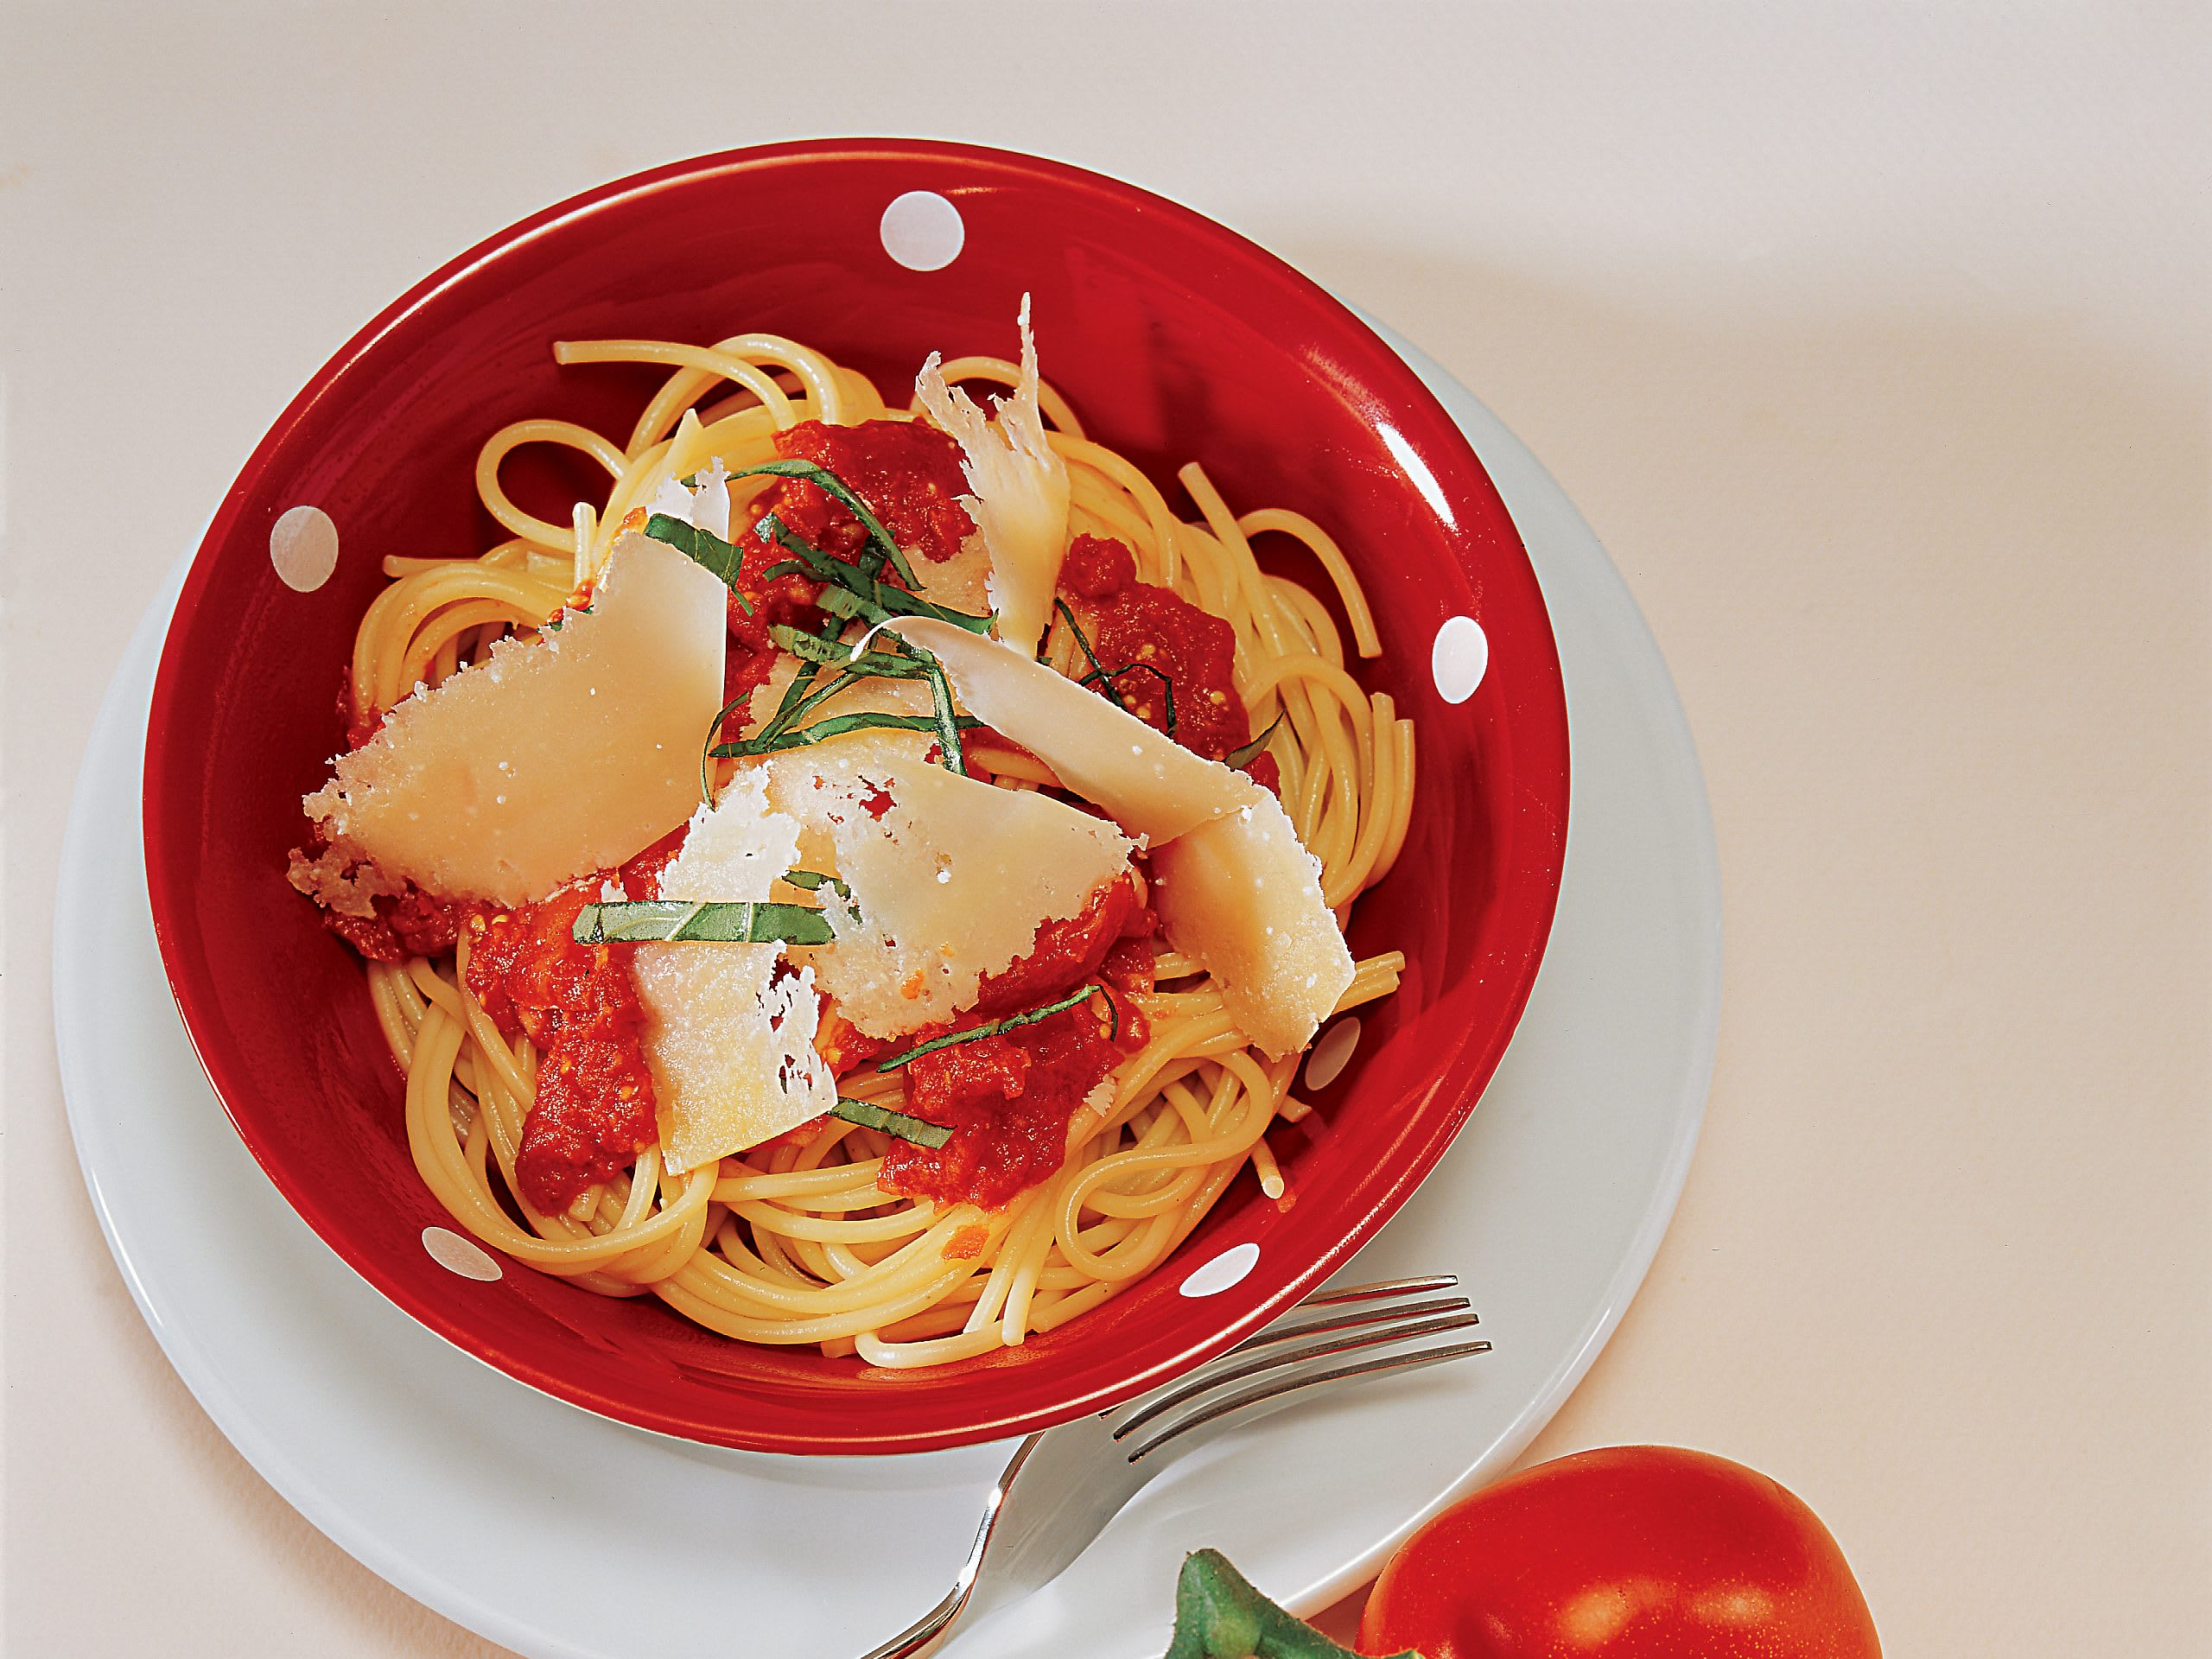 Spaghetti an roher Tomatensauce